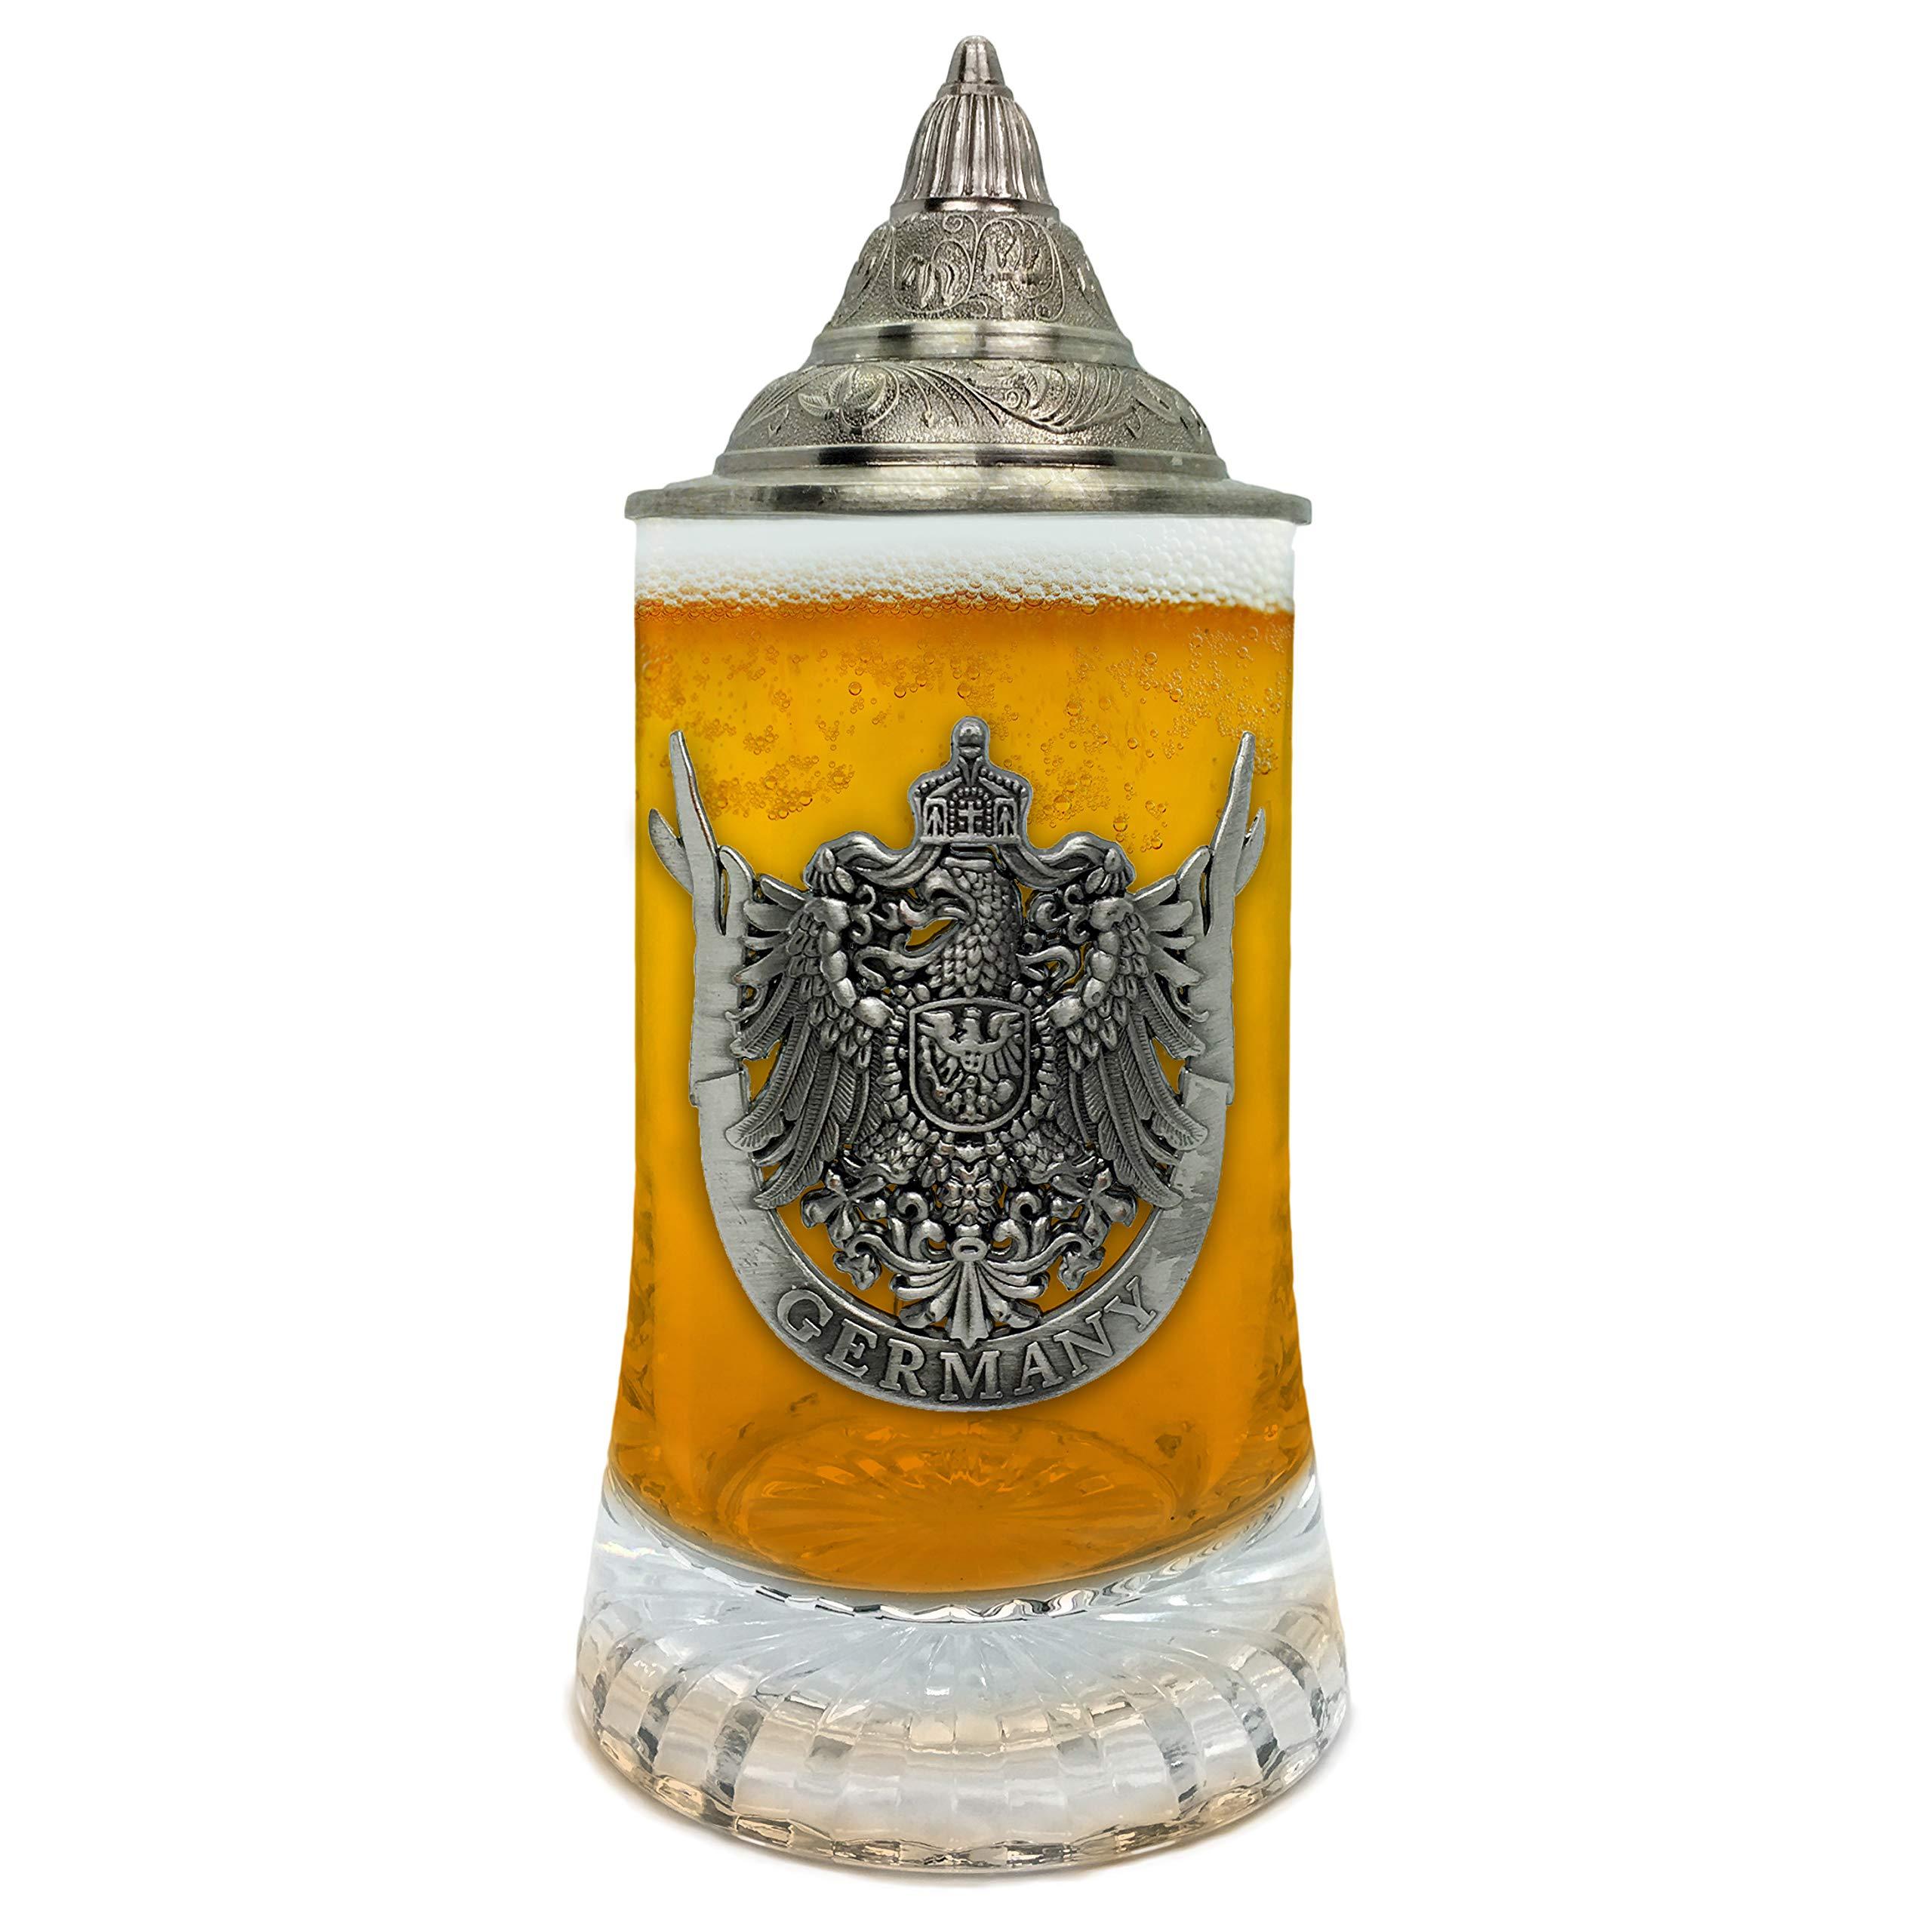 Beer Glass German Eagle Metal Medallion Bar Gifts for Men With Metal Lid Glass Mug by E.H.G. | .5 Liter